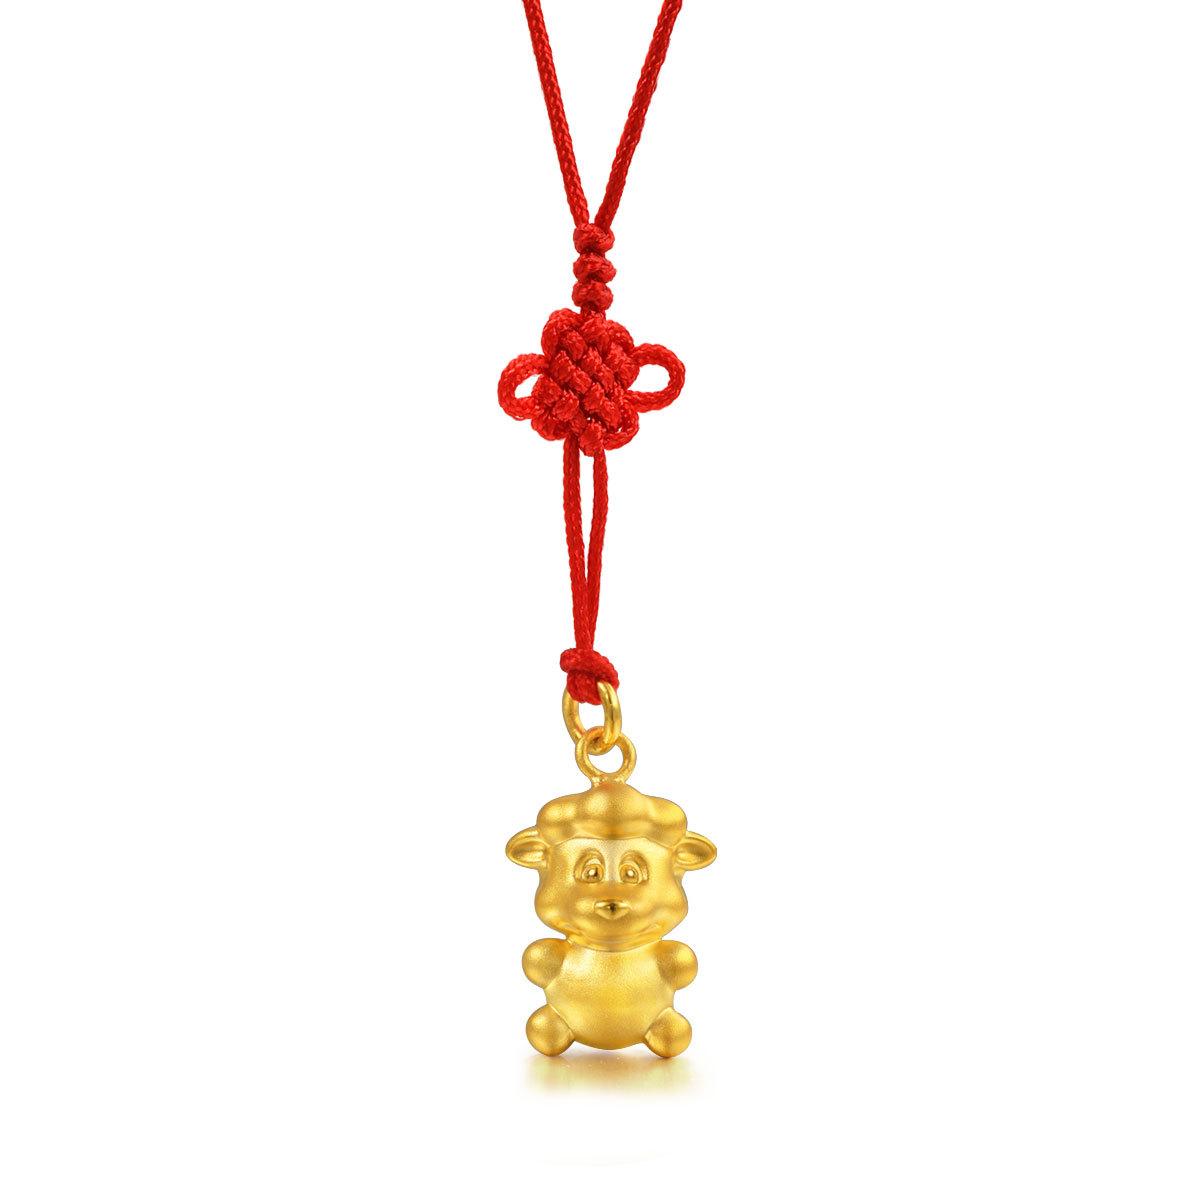 Xian Cultural Symbol Of Life Death Anwarul Firdhaus